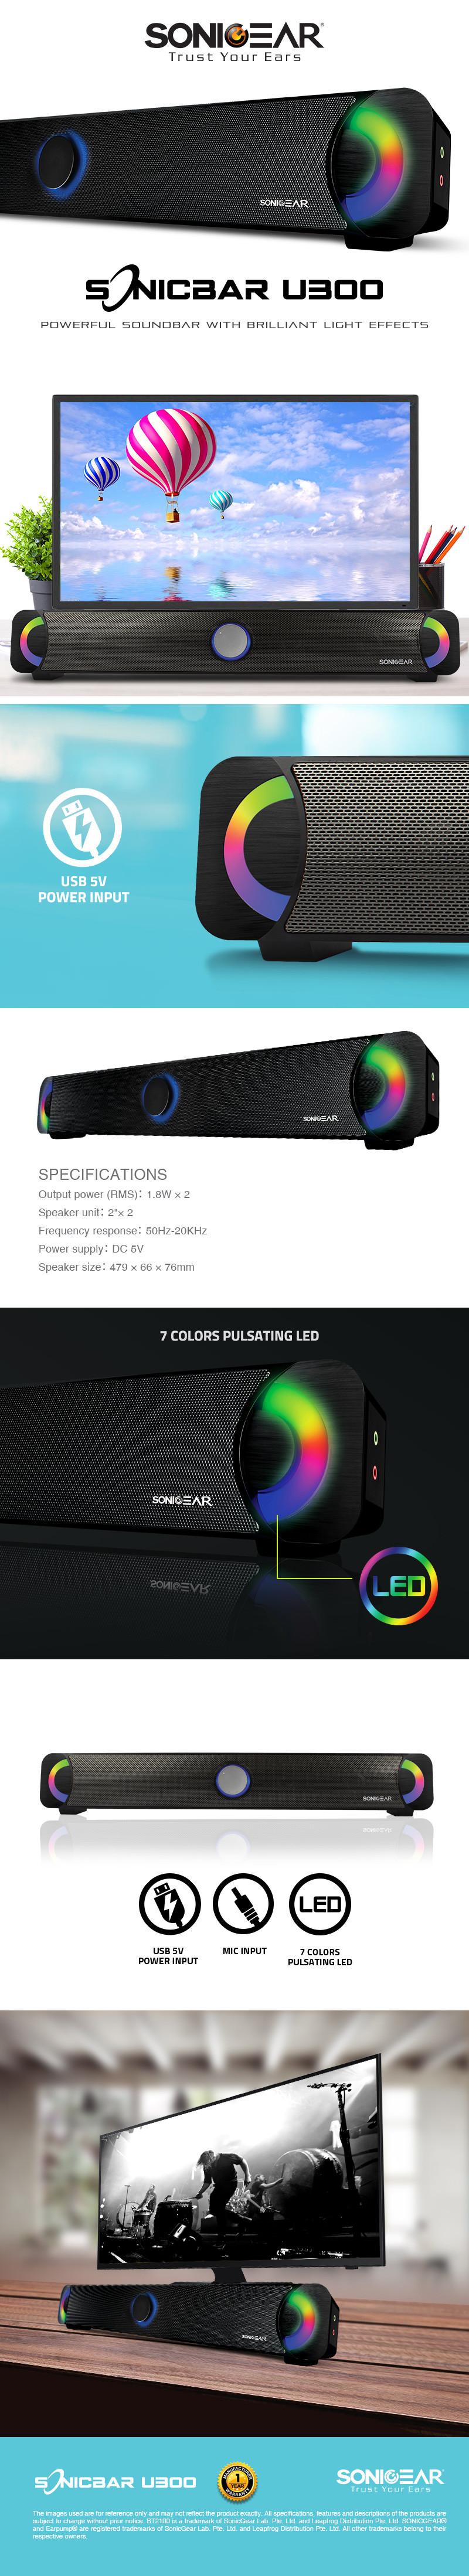 eDM-U300-Black-Only.jpg